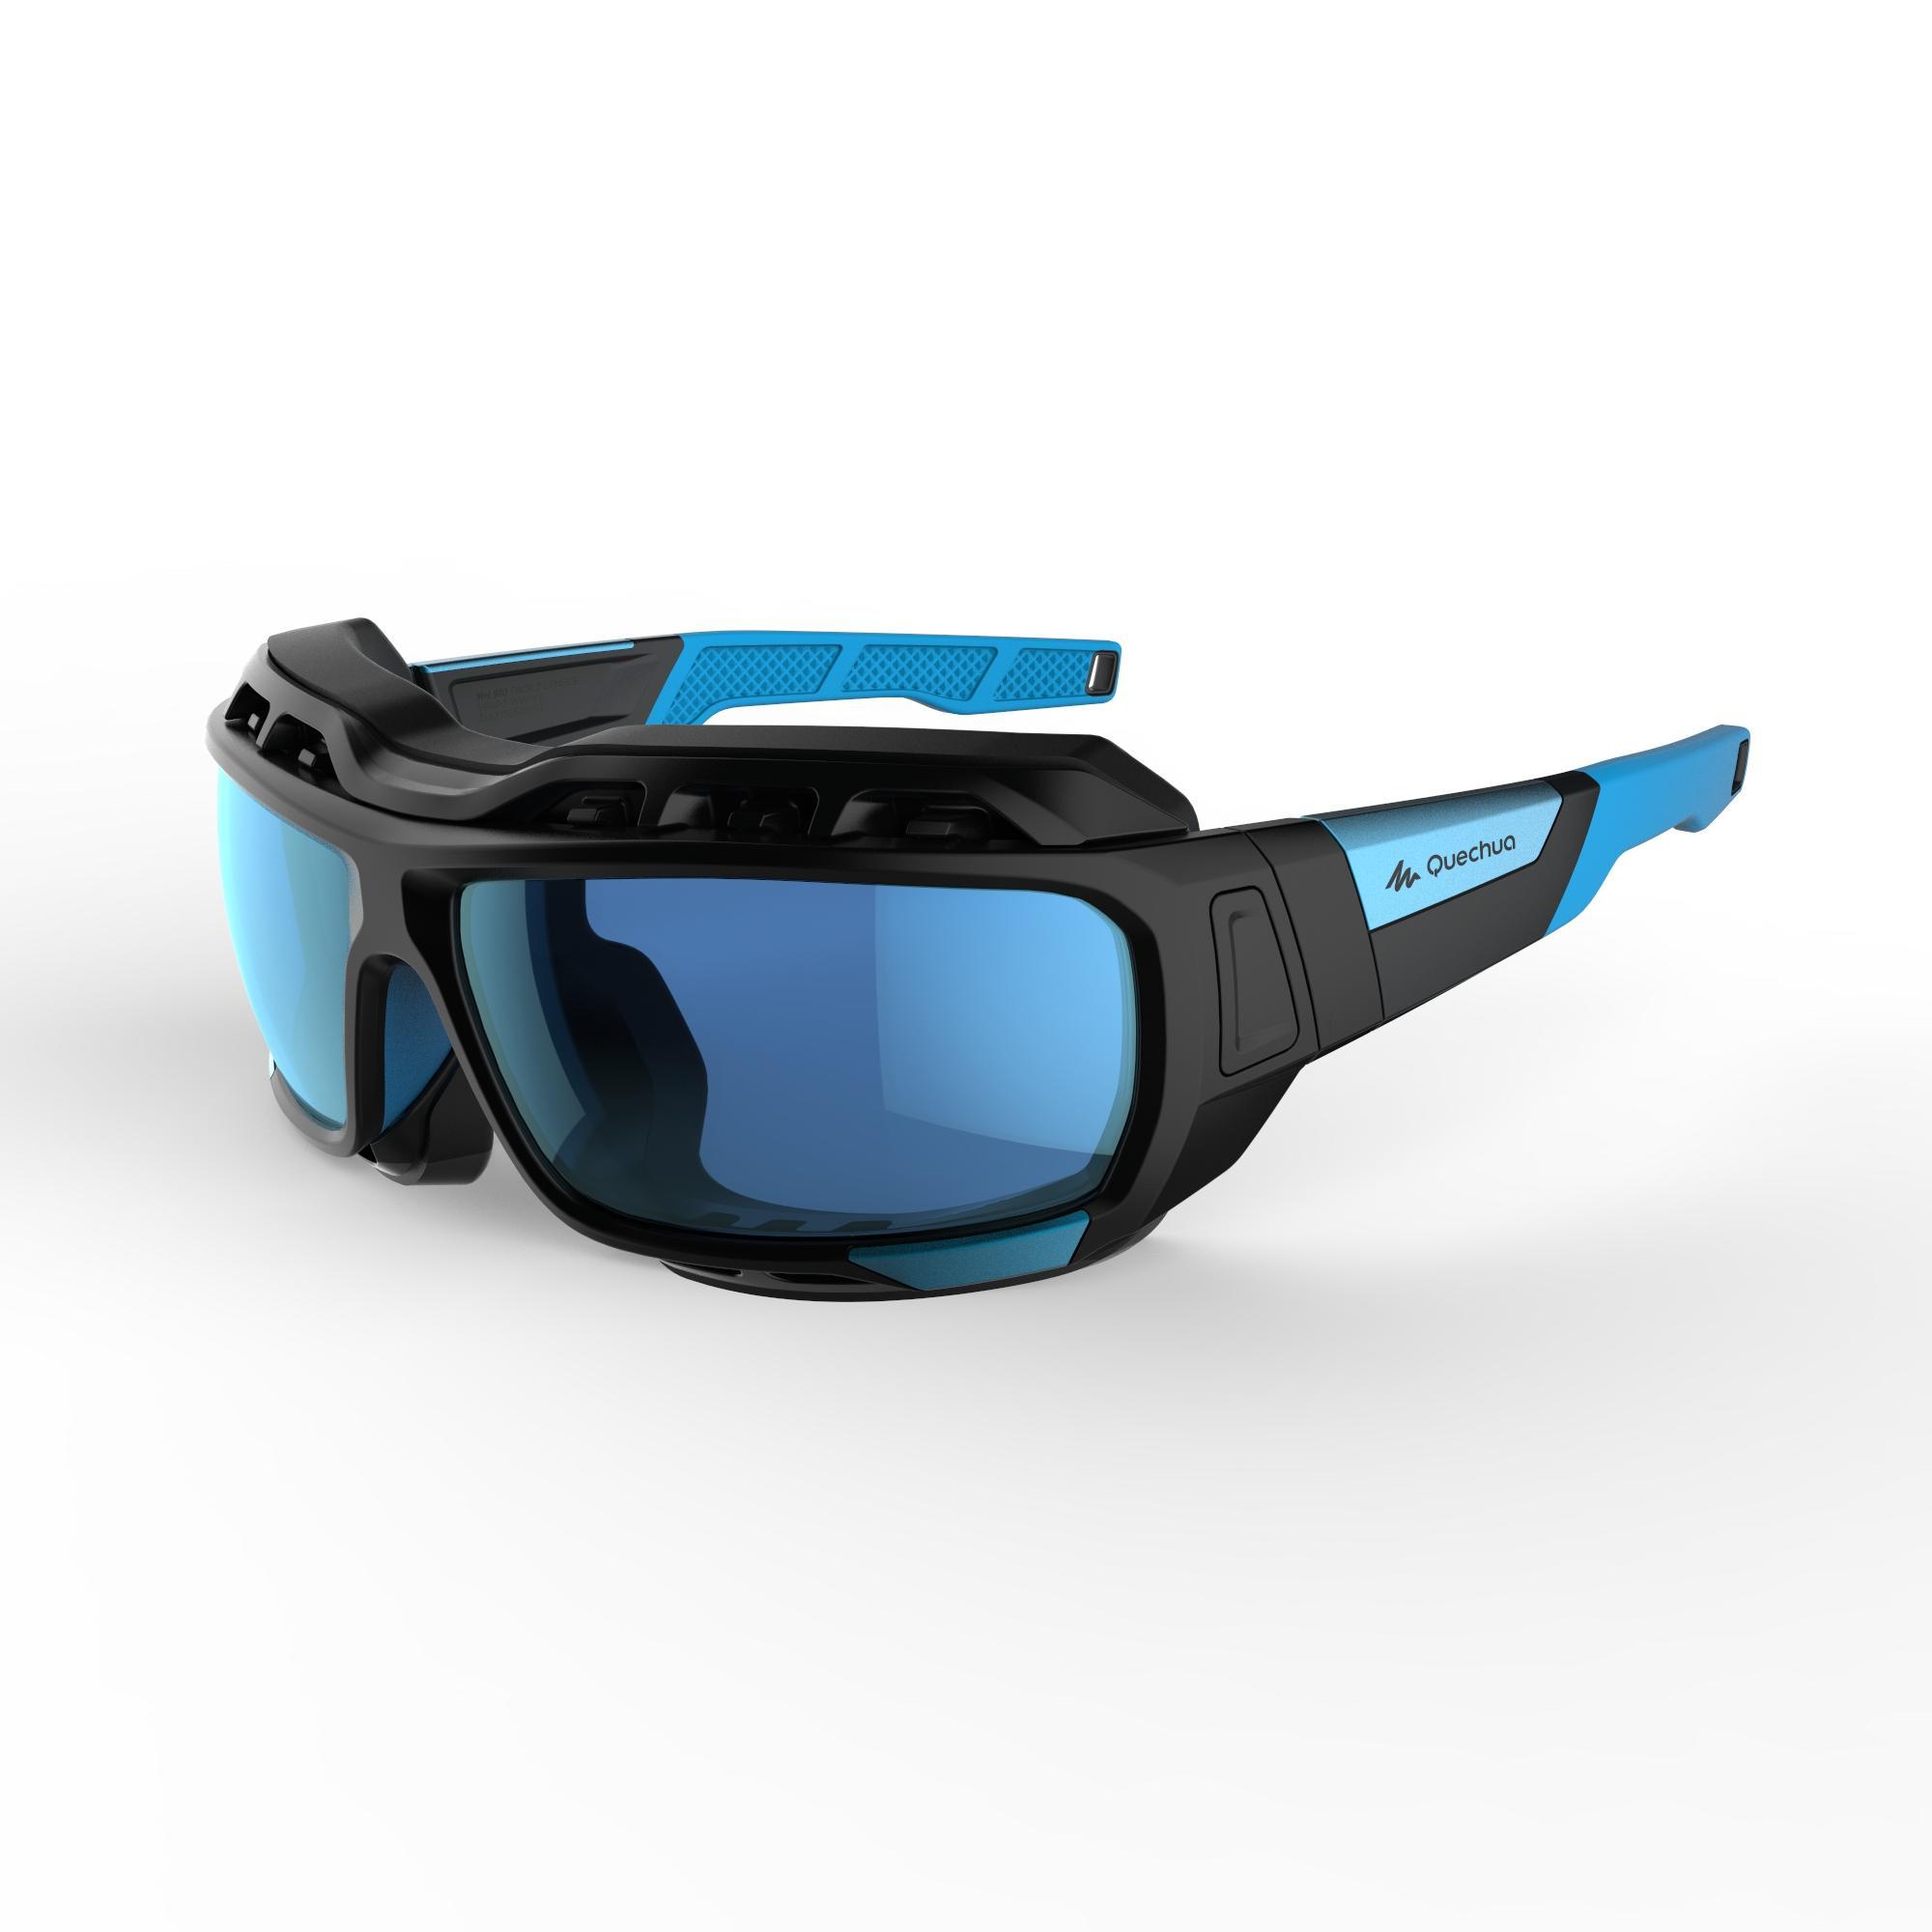 Hiking Sunglasses MH910 Category 4 (2 Interchangeable Lenses) - Black/Blue